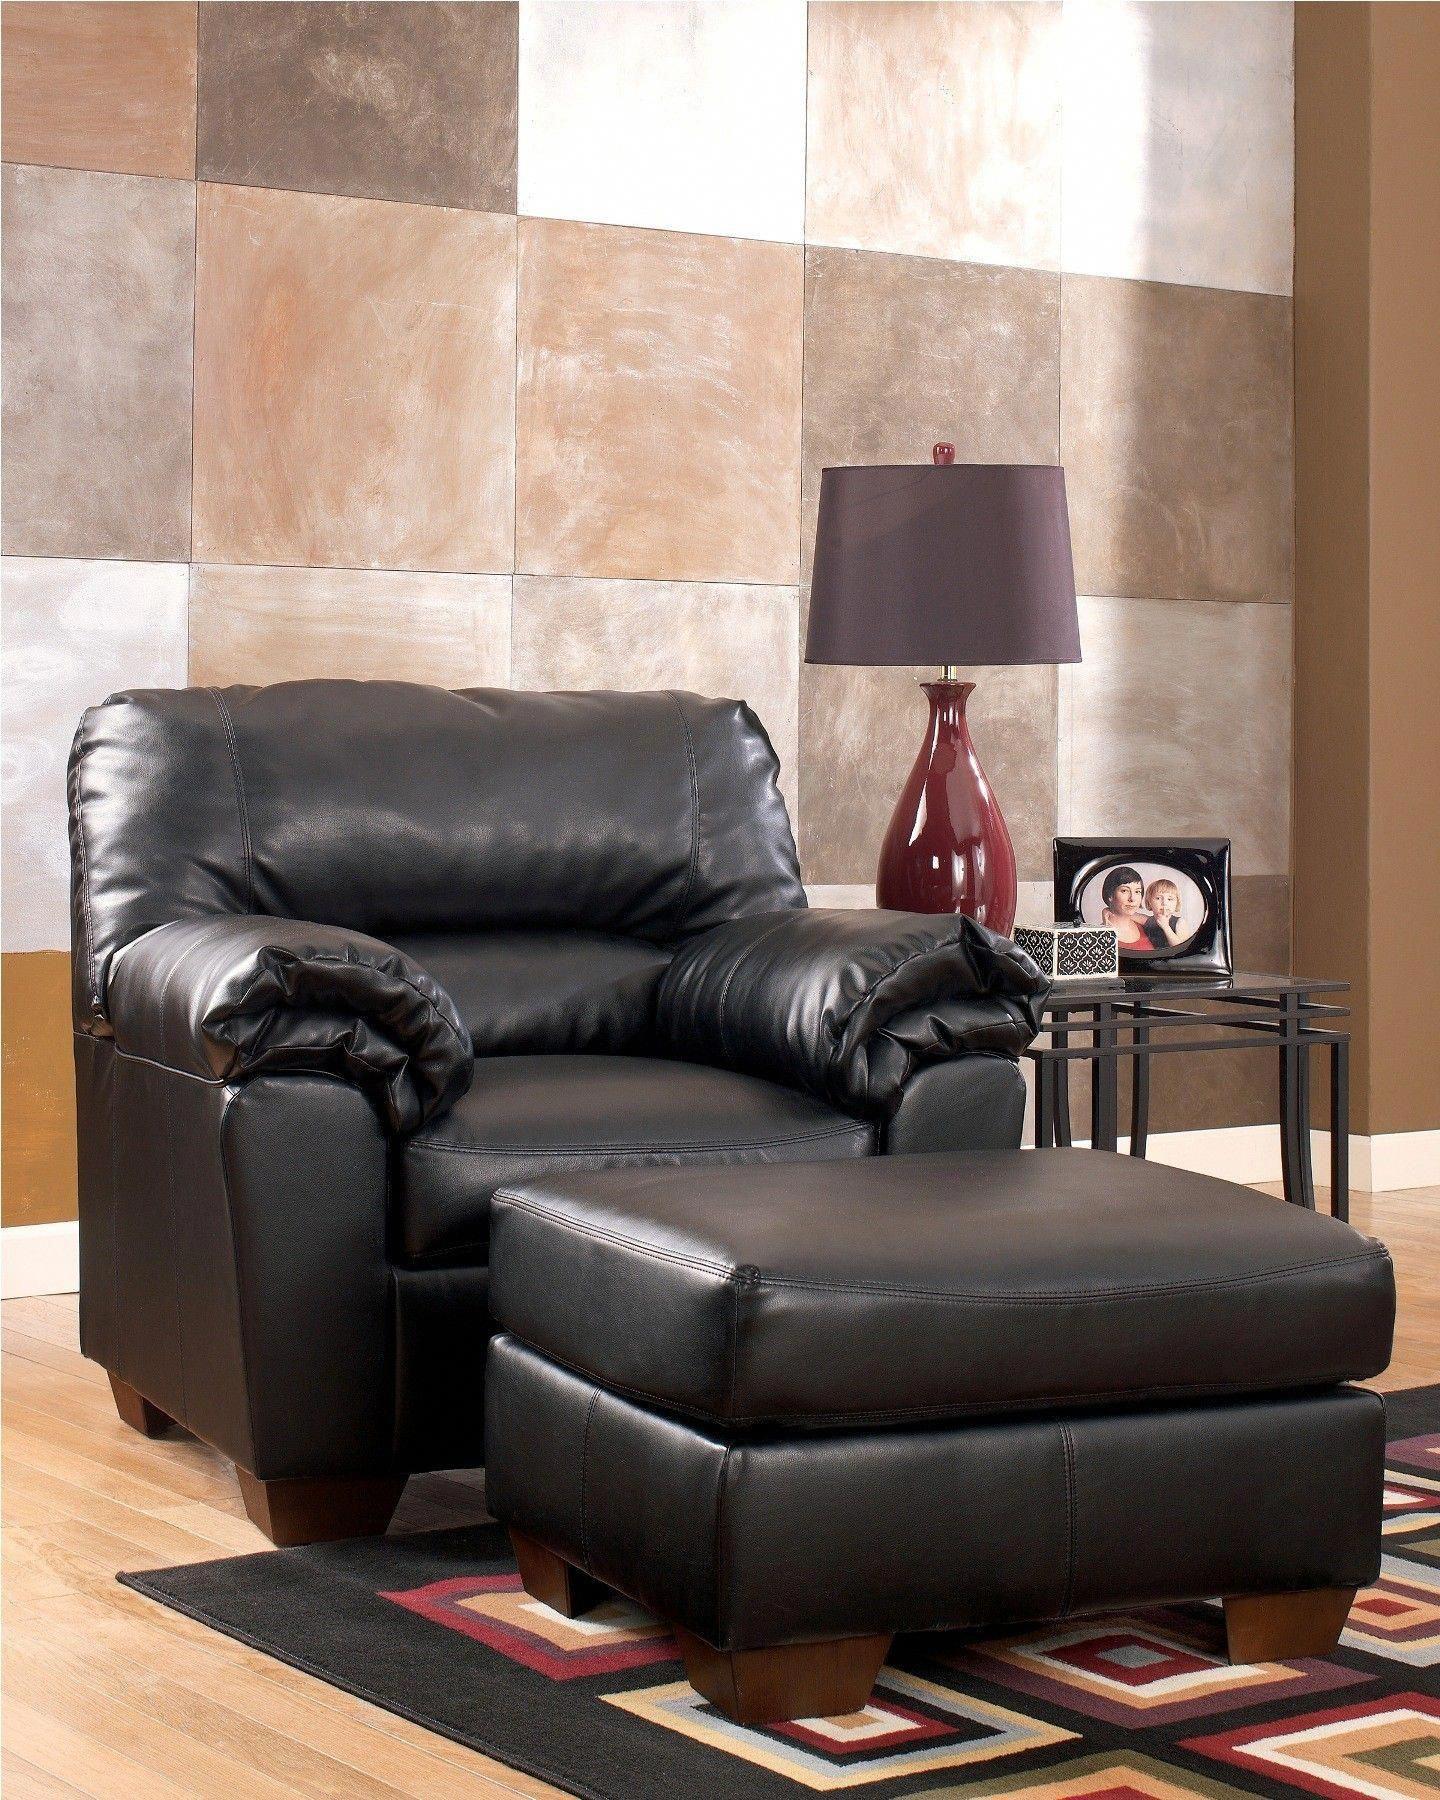 Commando Black Leather Sofa Chair A Few Black Leather Sofa Ideas